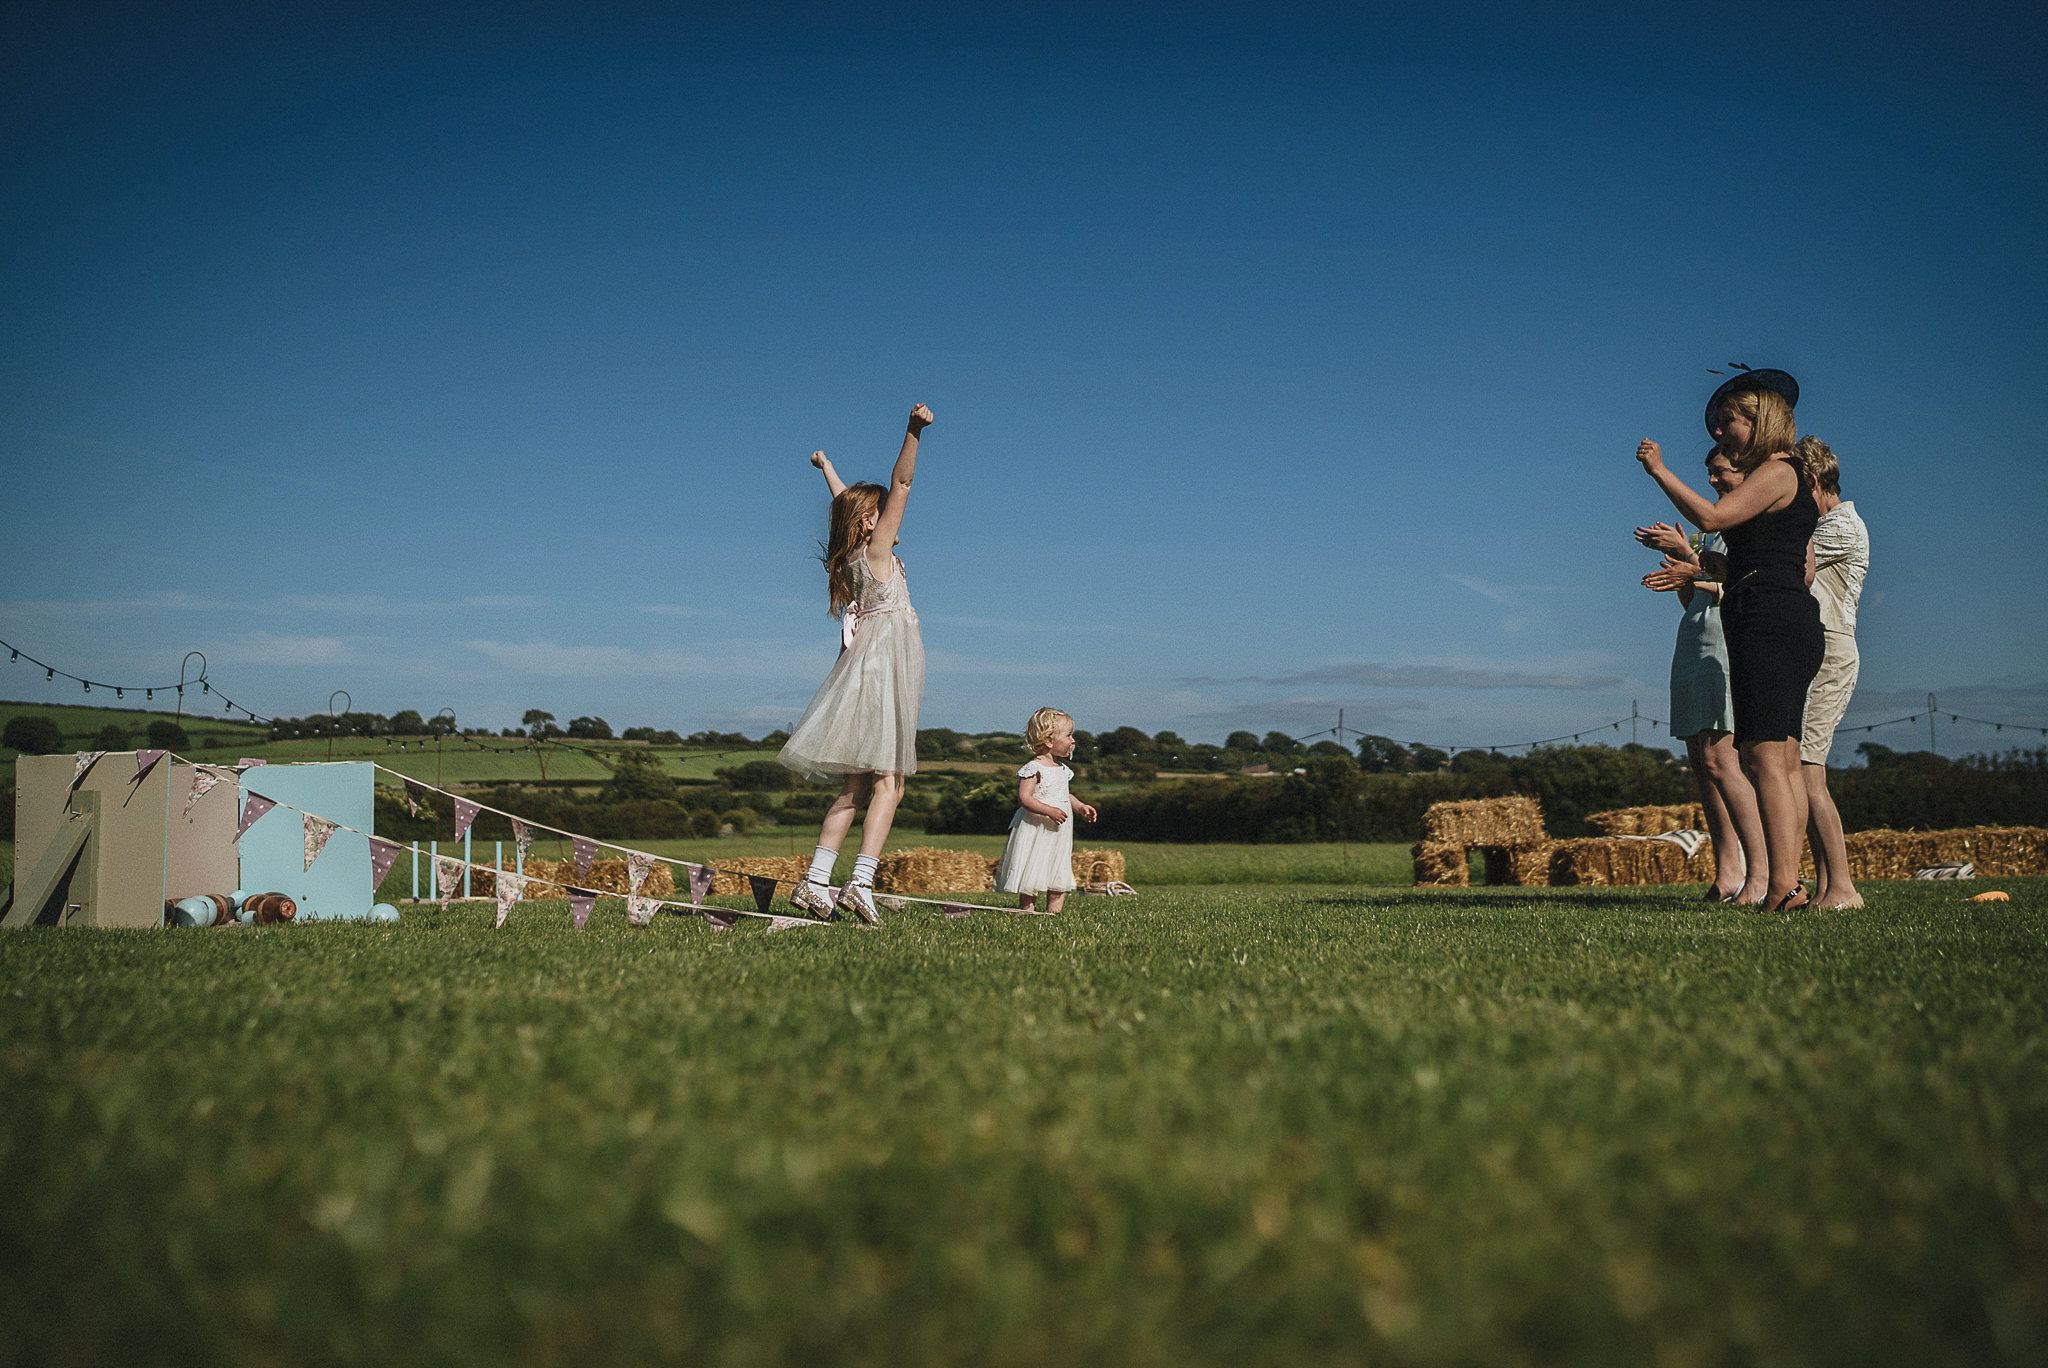 paul-marbrook-Farm-Wedding-Photographer-Lancashire-90059